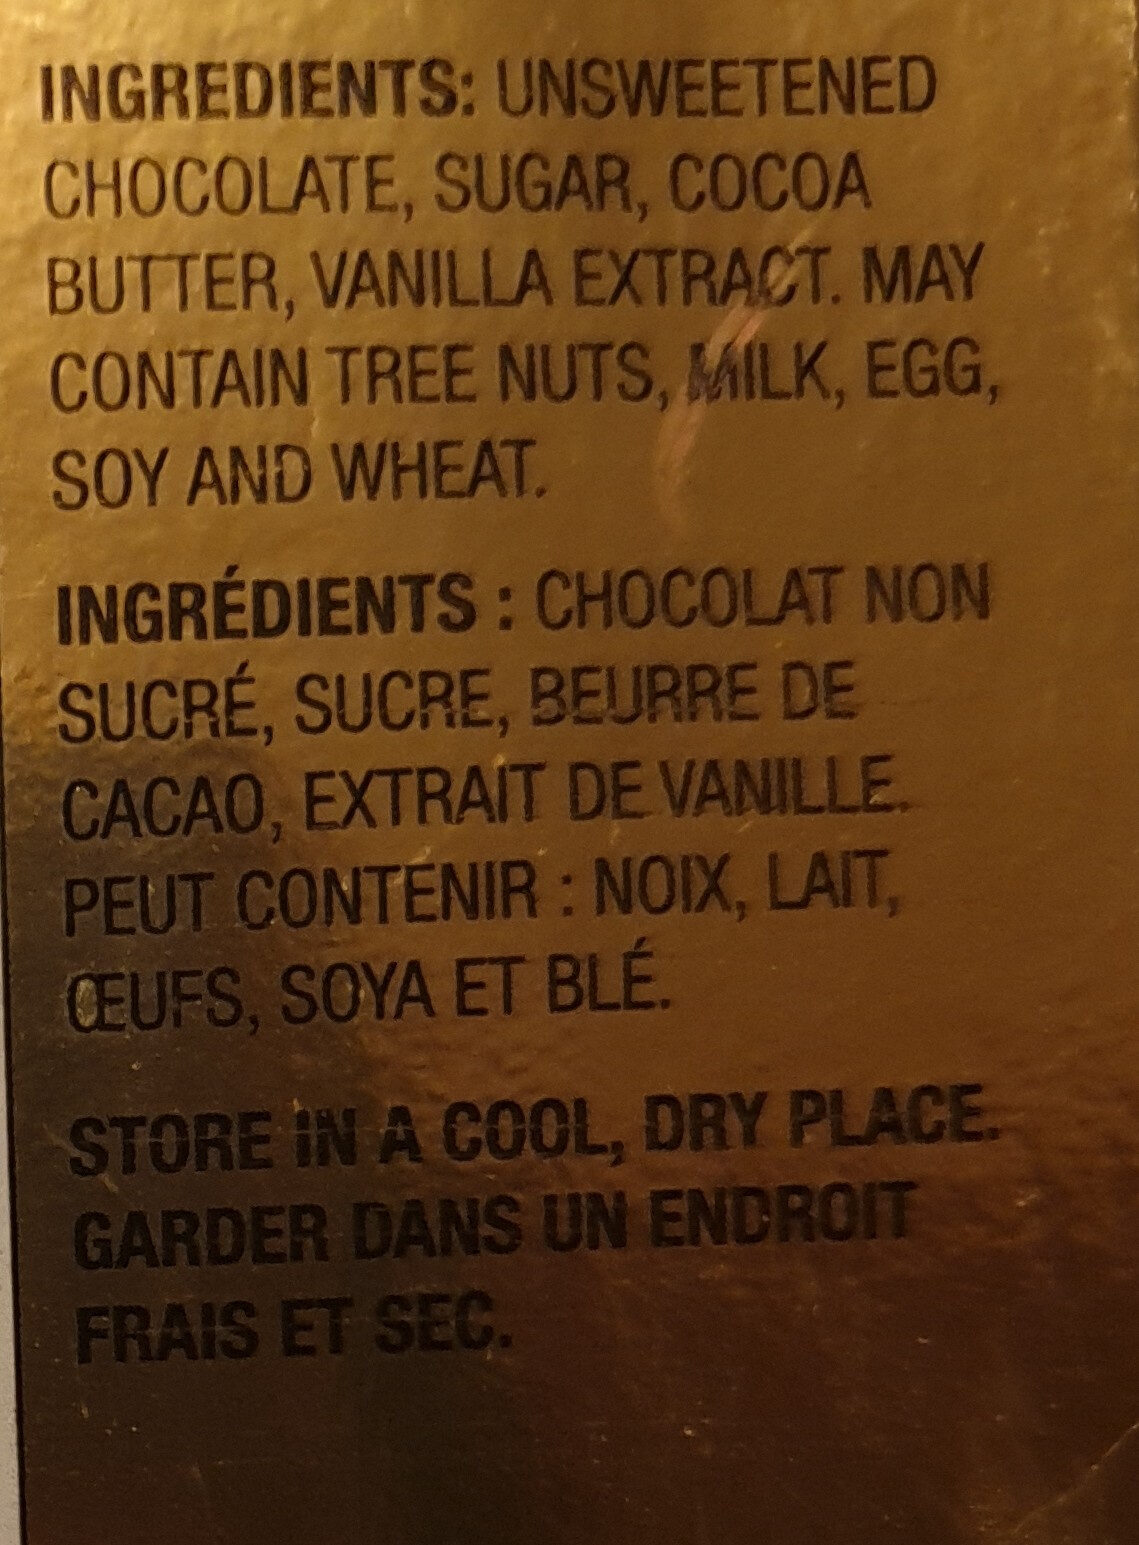 Cocoa solids extra dark chocolate - Ingredients - en